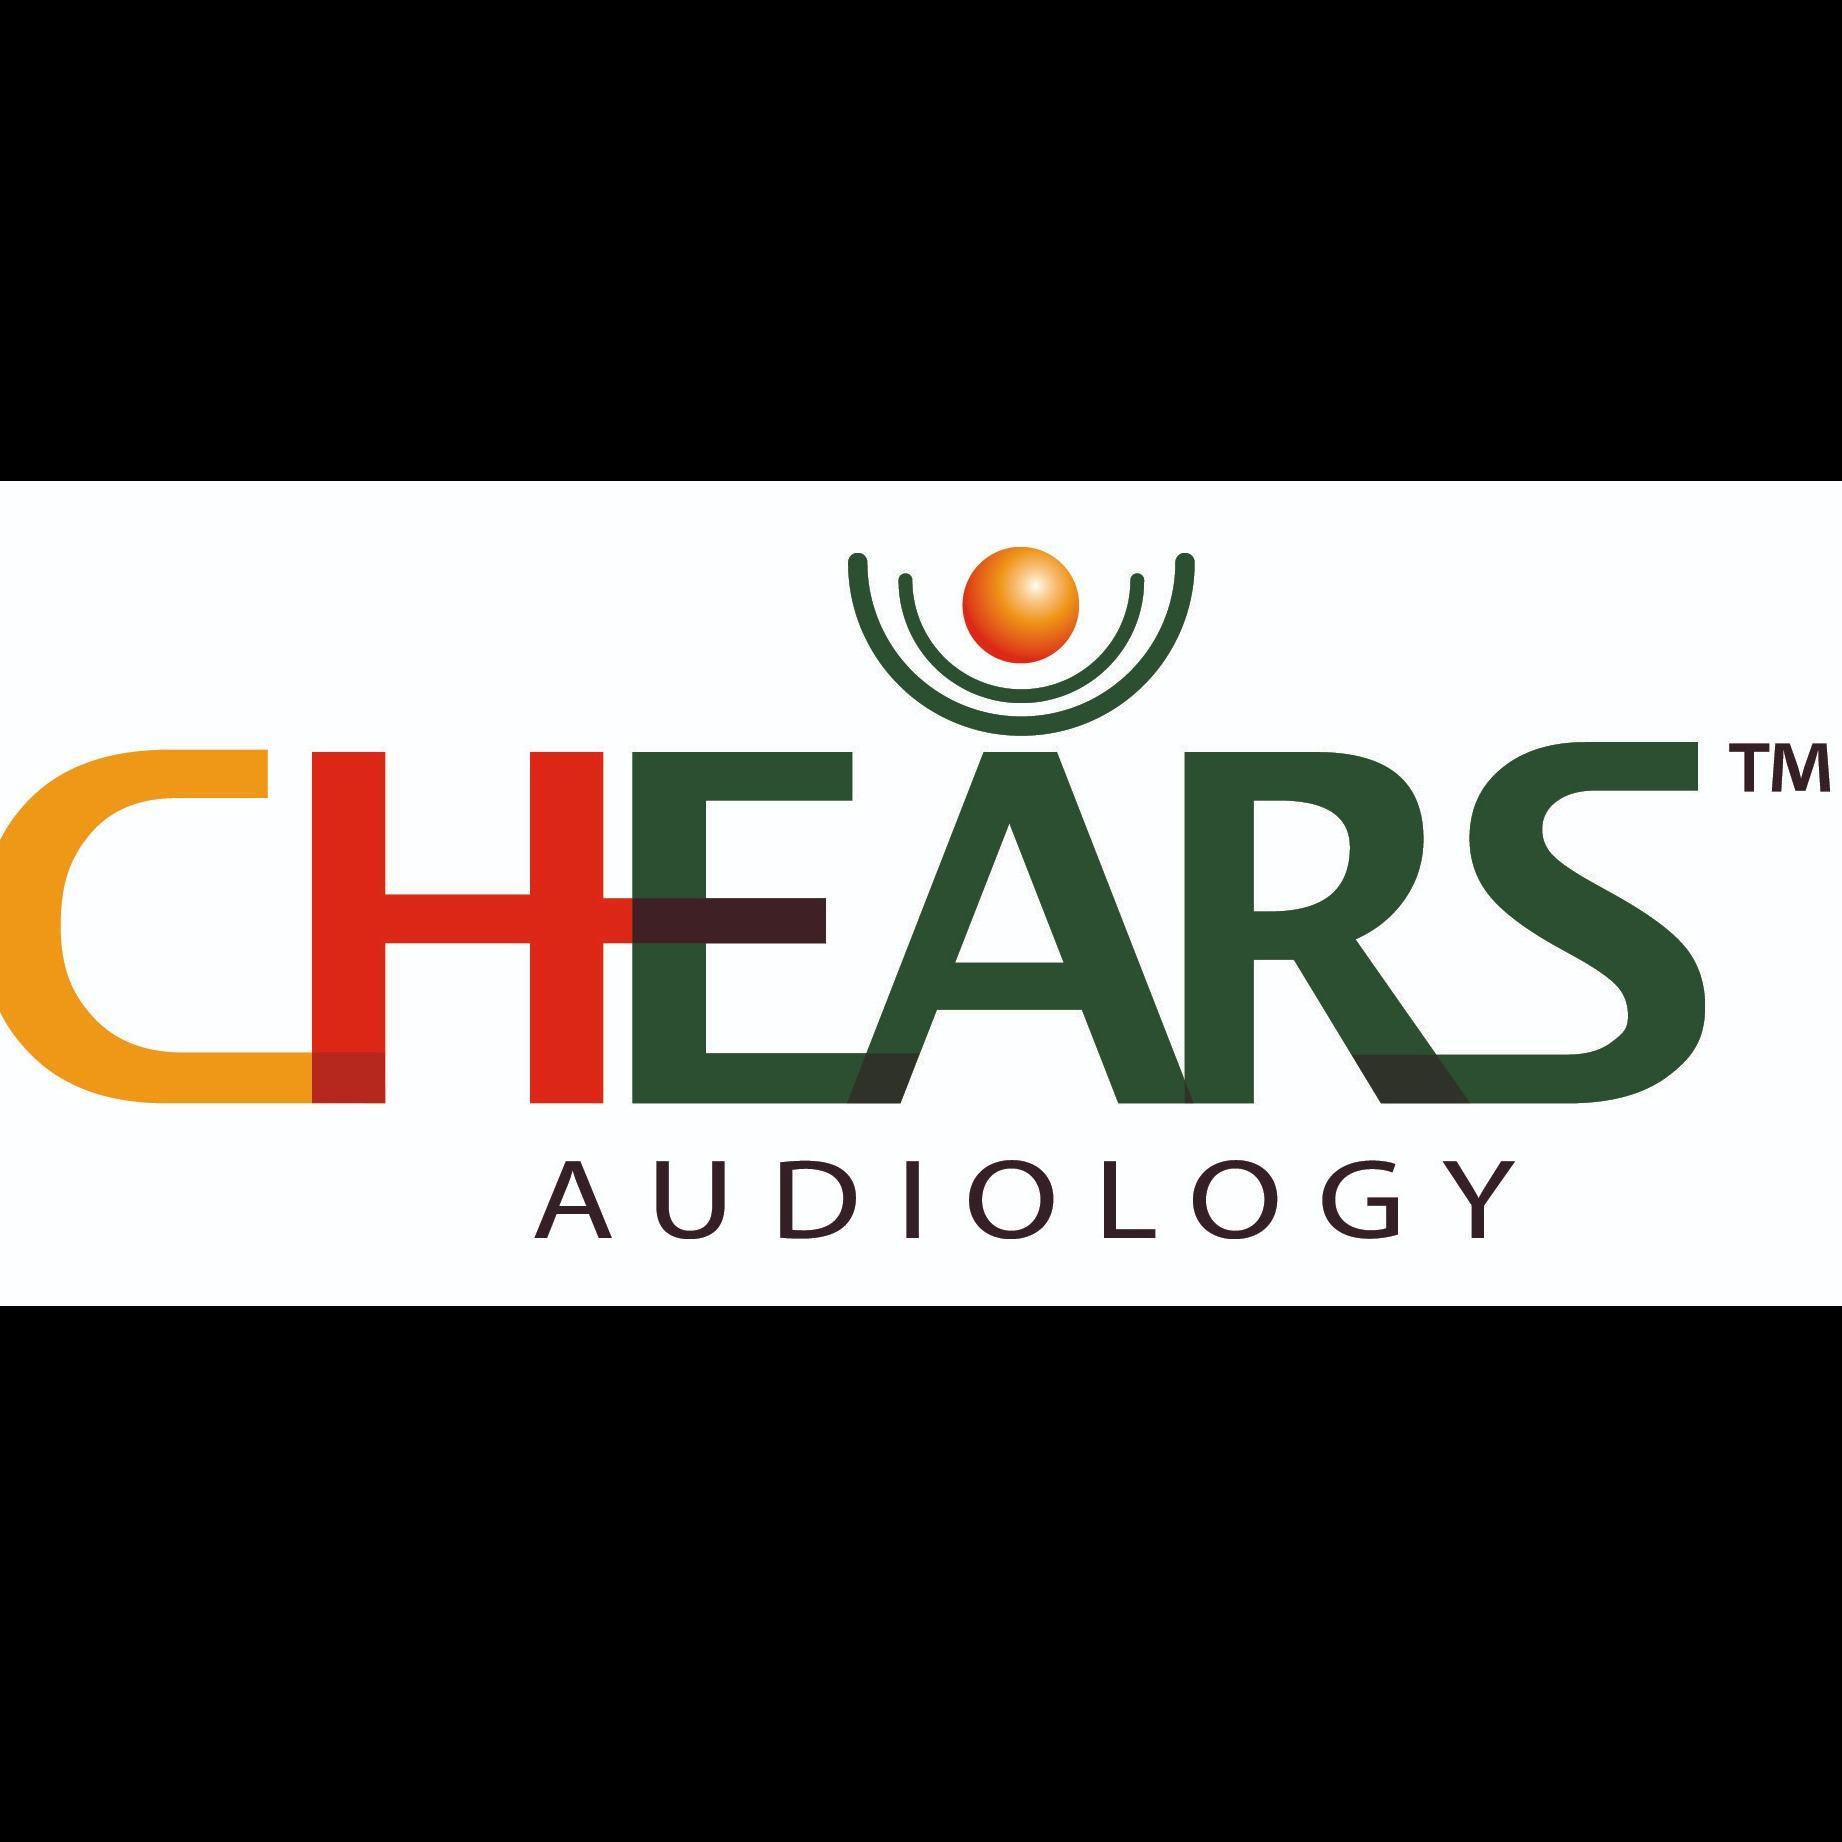 Chears Audiology Minneapolis